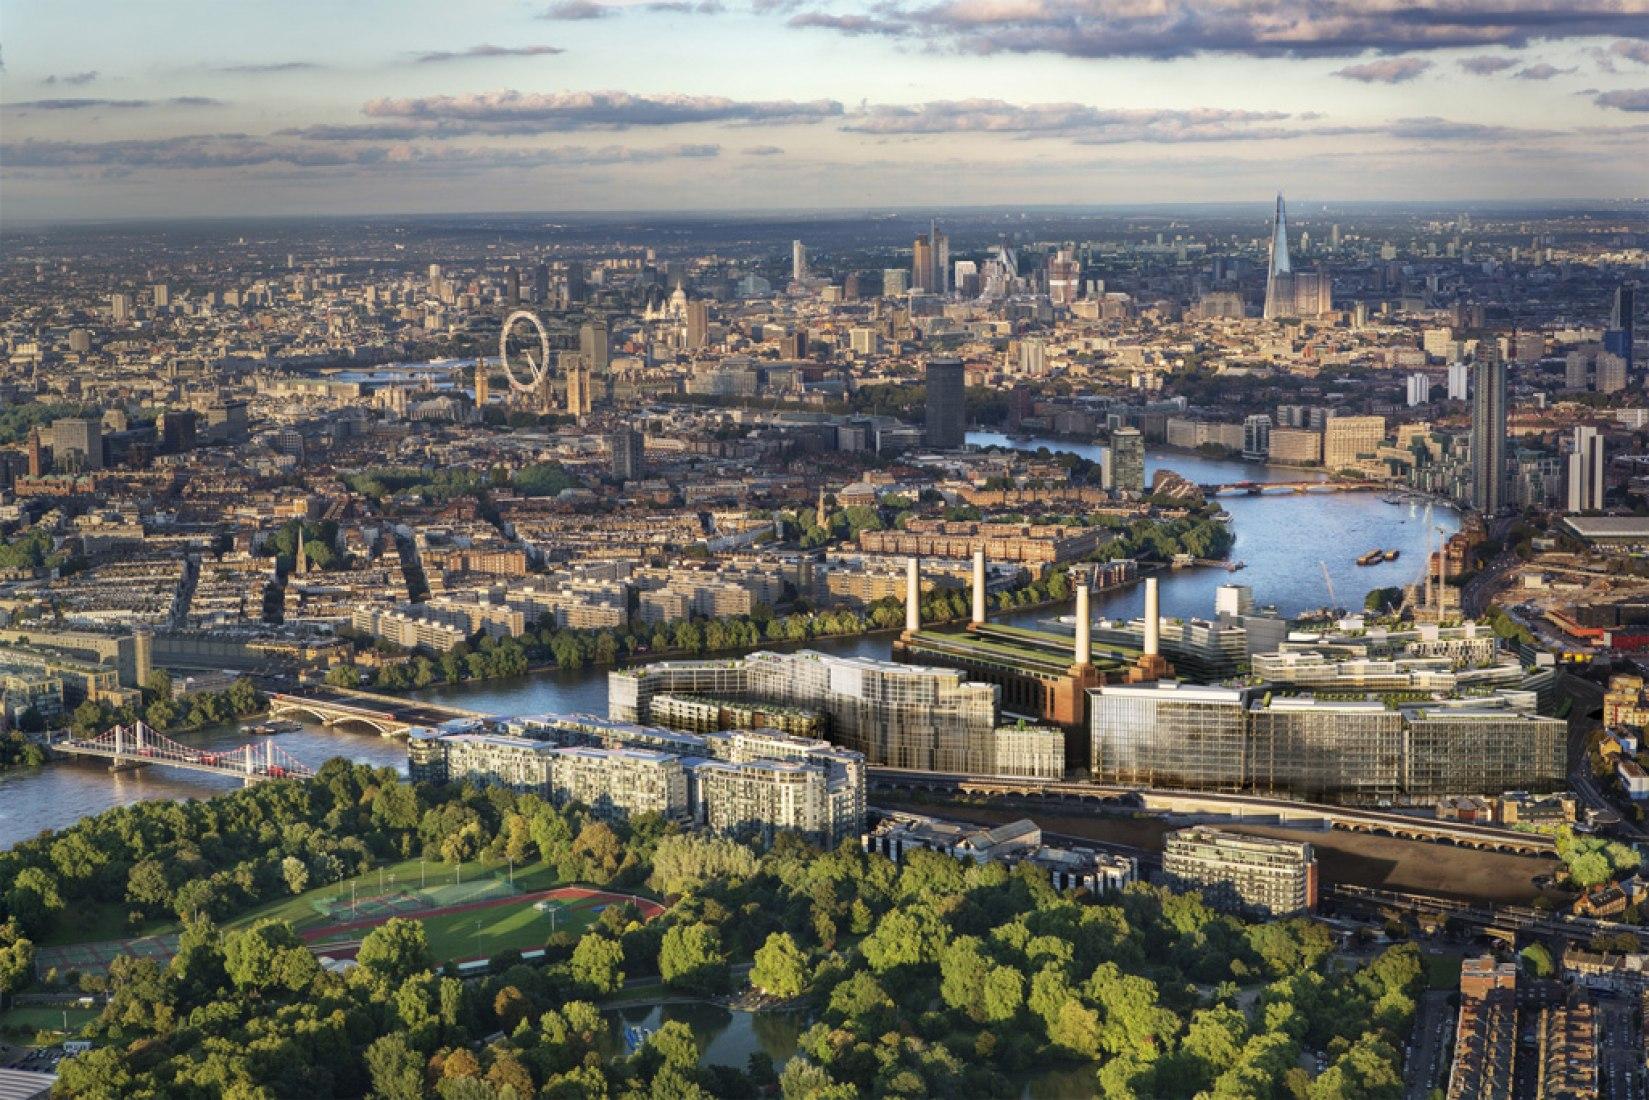 Vista aérea de la central eléctrica de Battersea CGI: Battersea Power Station Development Company 2012.